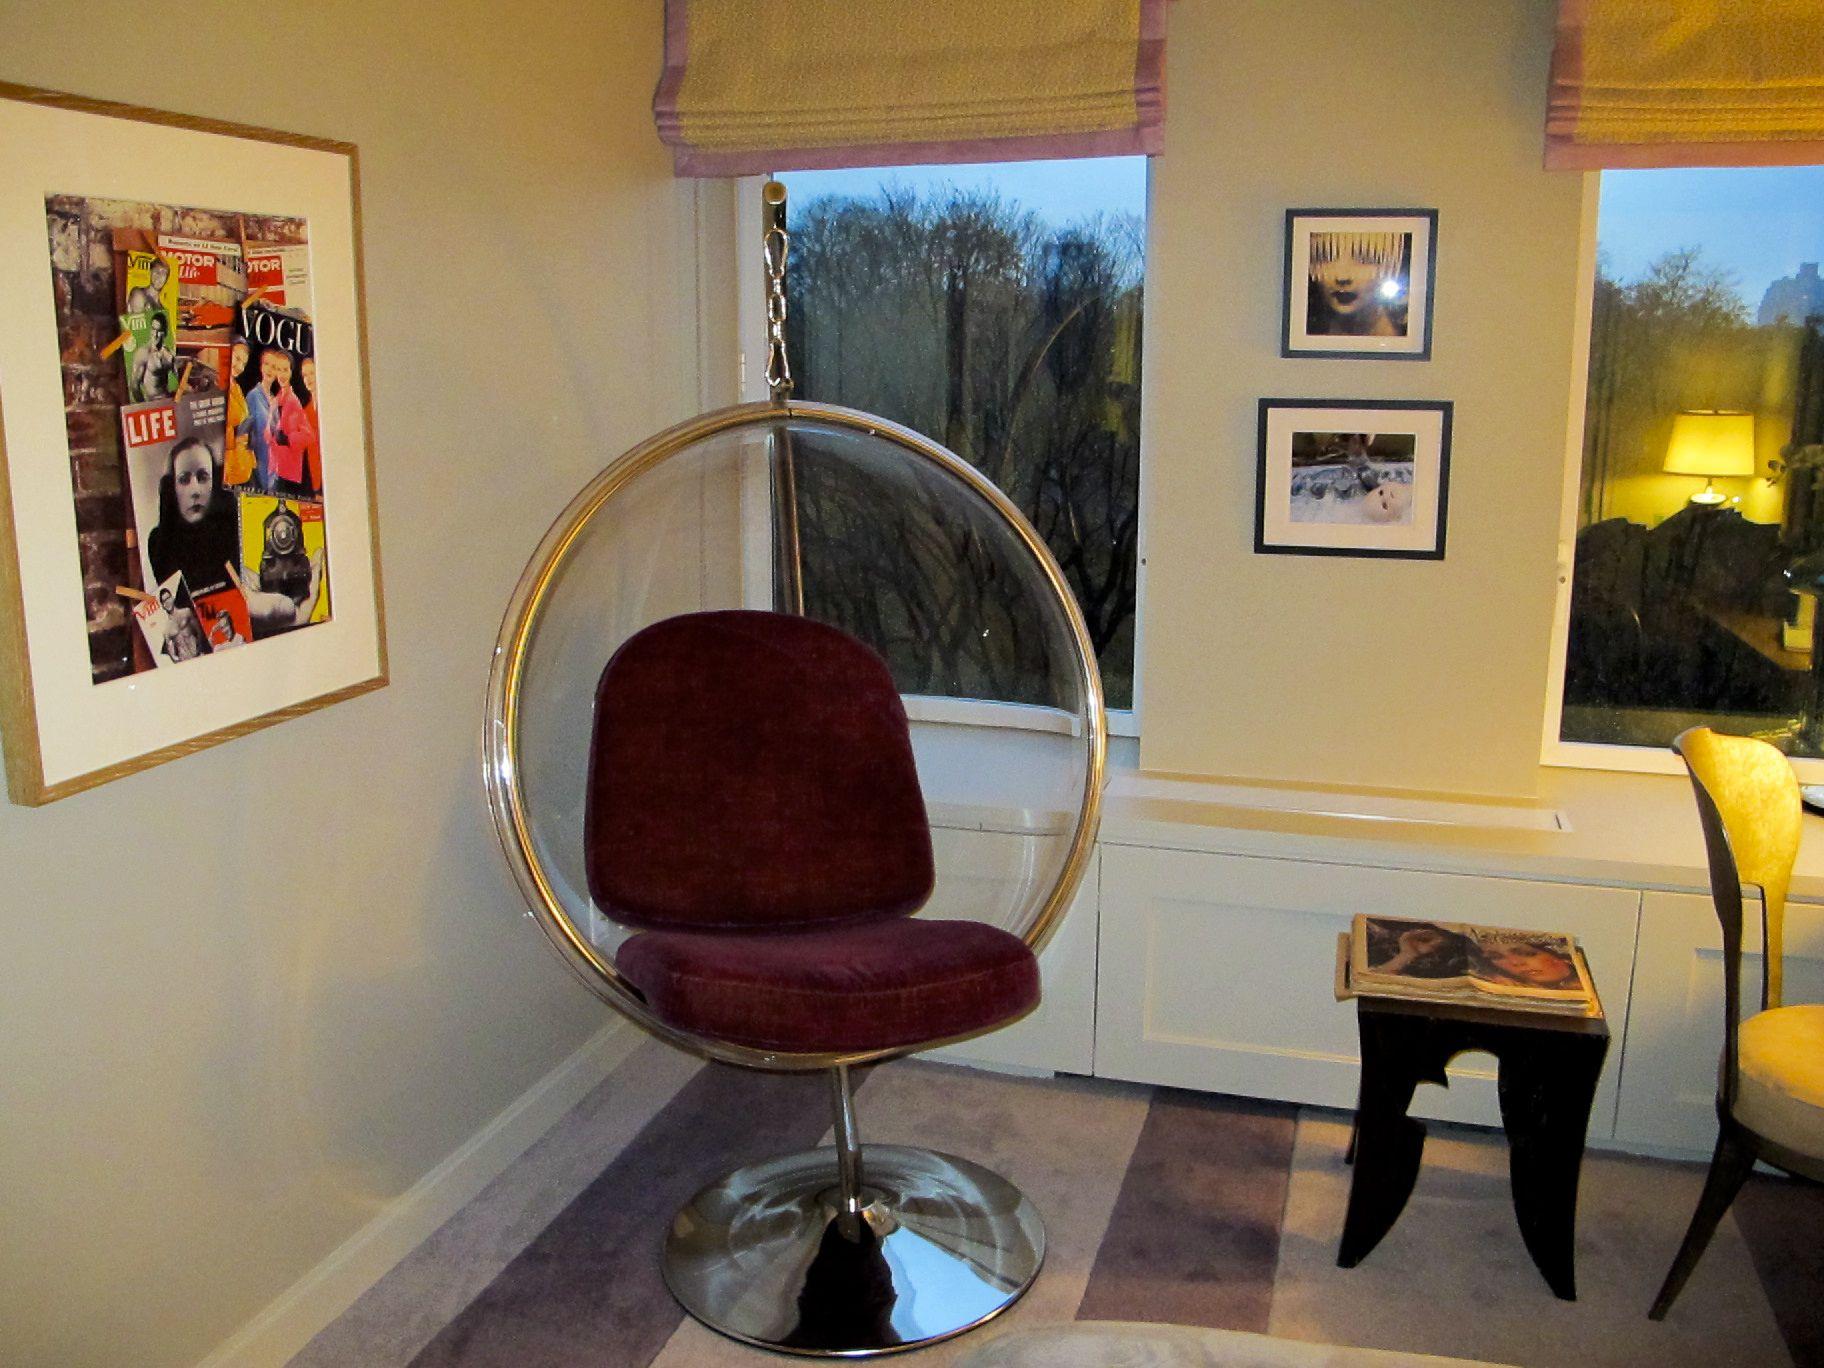 Best 25+ Dorm room chairs ideas on Pinterest | Dorm desk ...